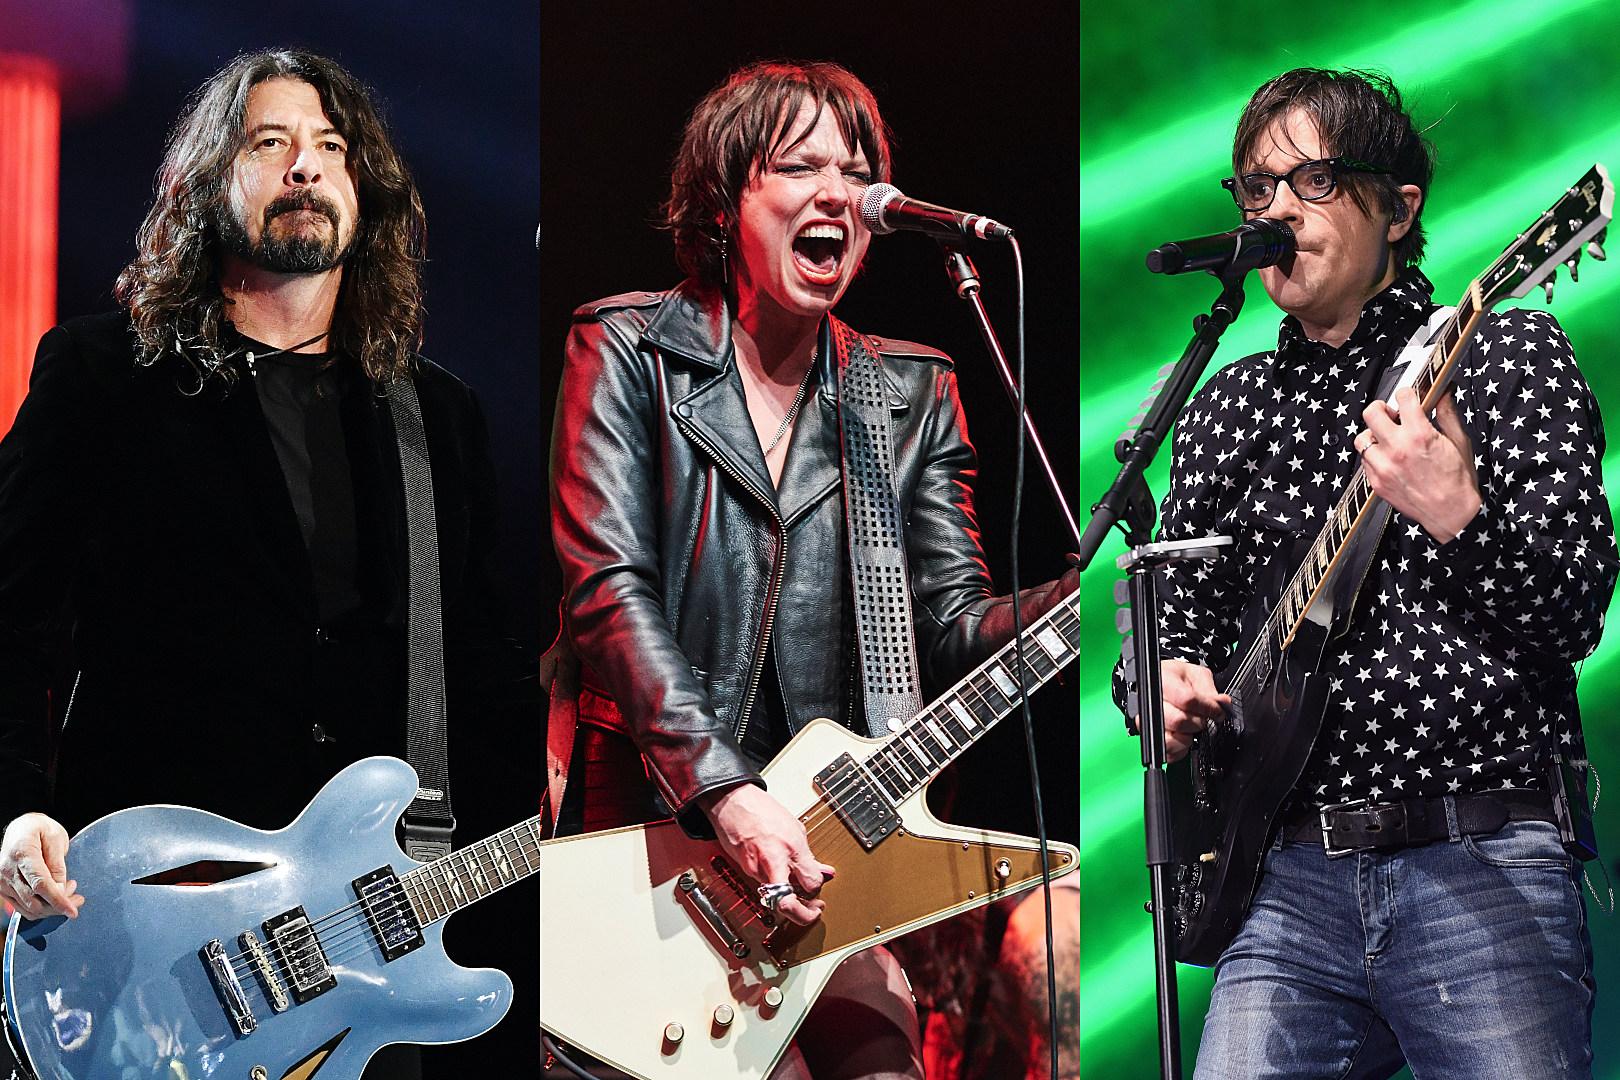 Foo Fighters, Halestorm, Weezer Sign Planned Parenthood Voting Ad